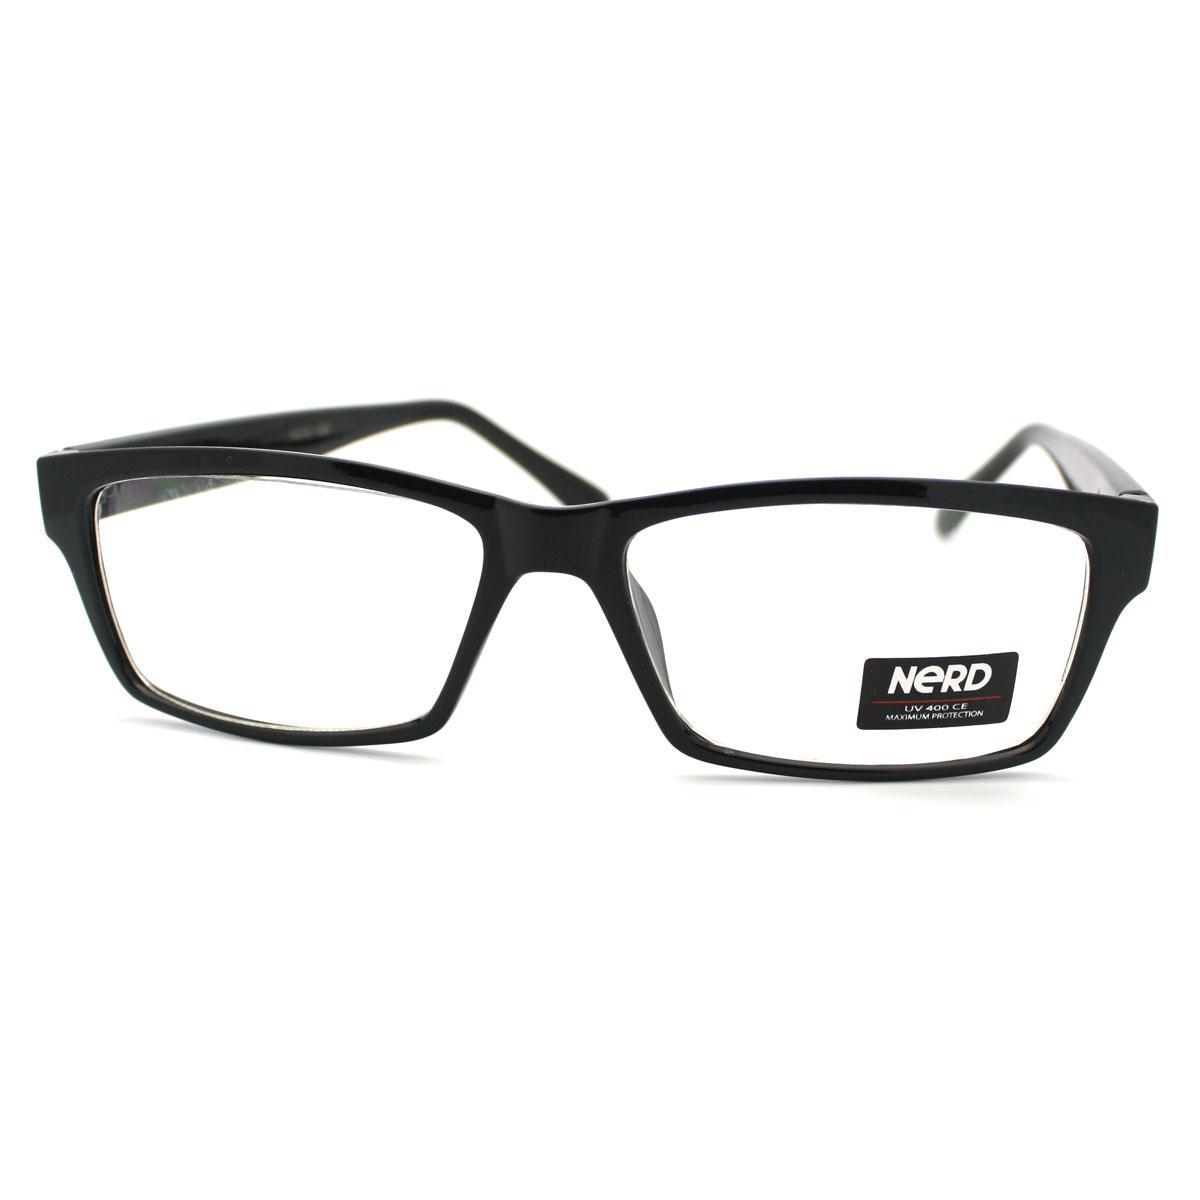 Glasses Frames Black On Top Clear On Bottom : Unisex New Geeky Nerd Narrow Rectangular Clear Lens ...